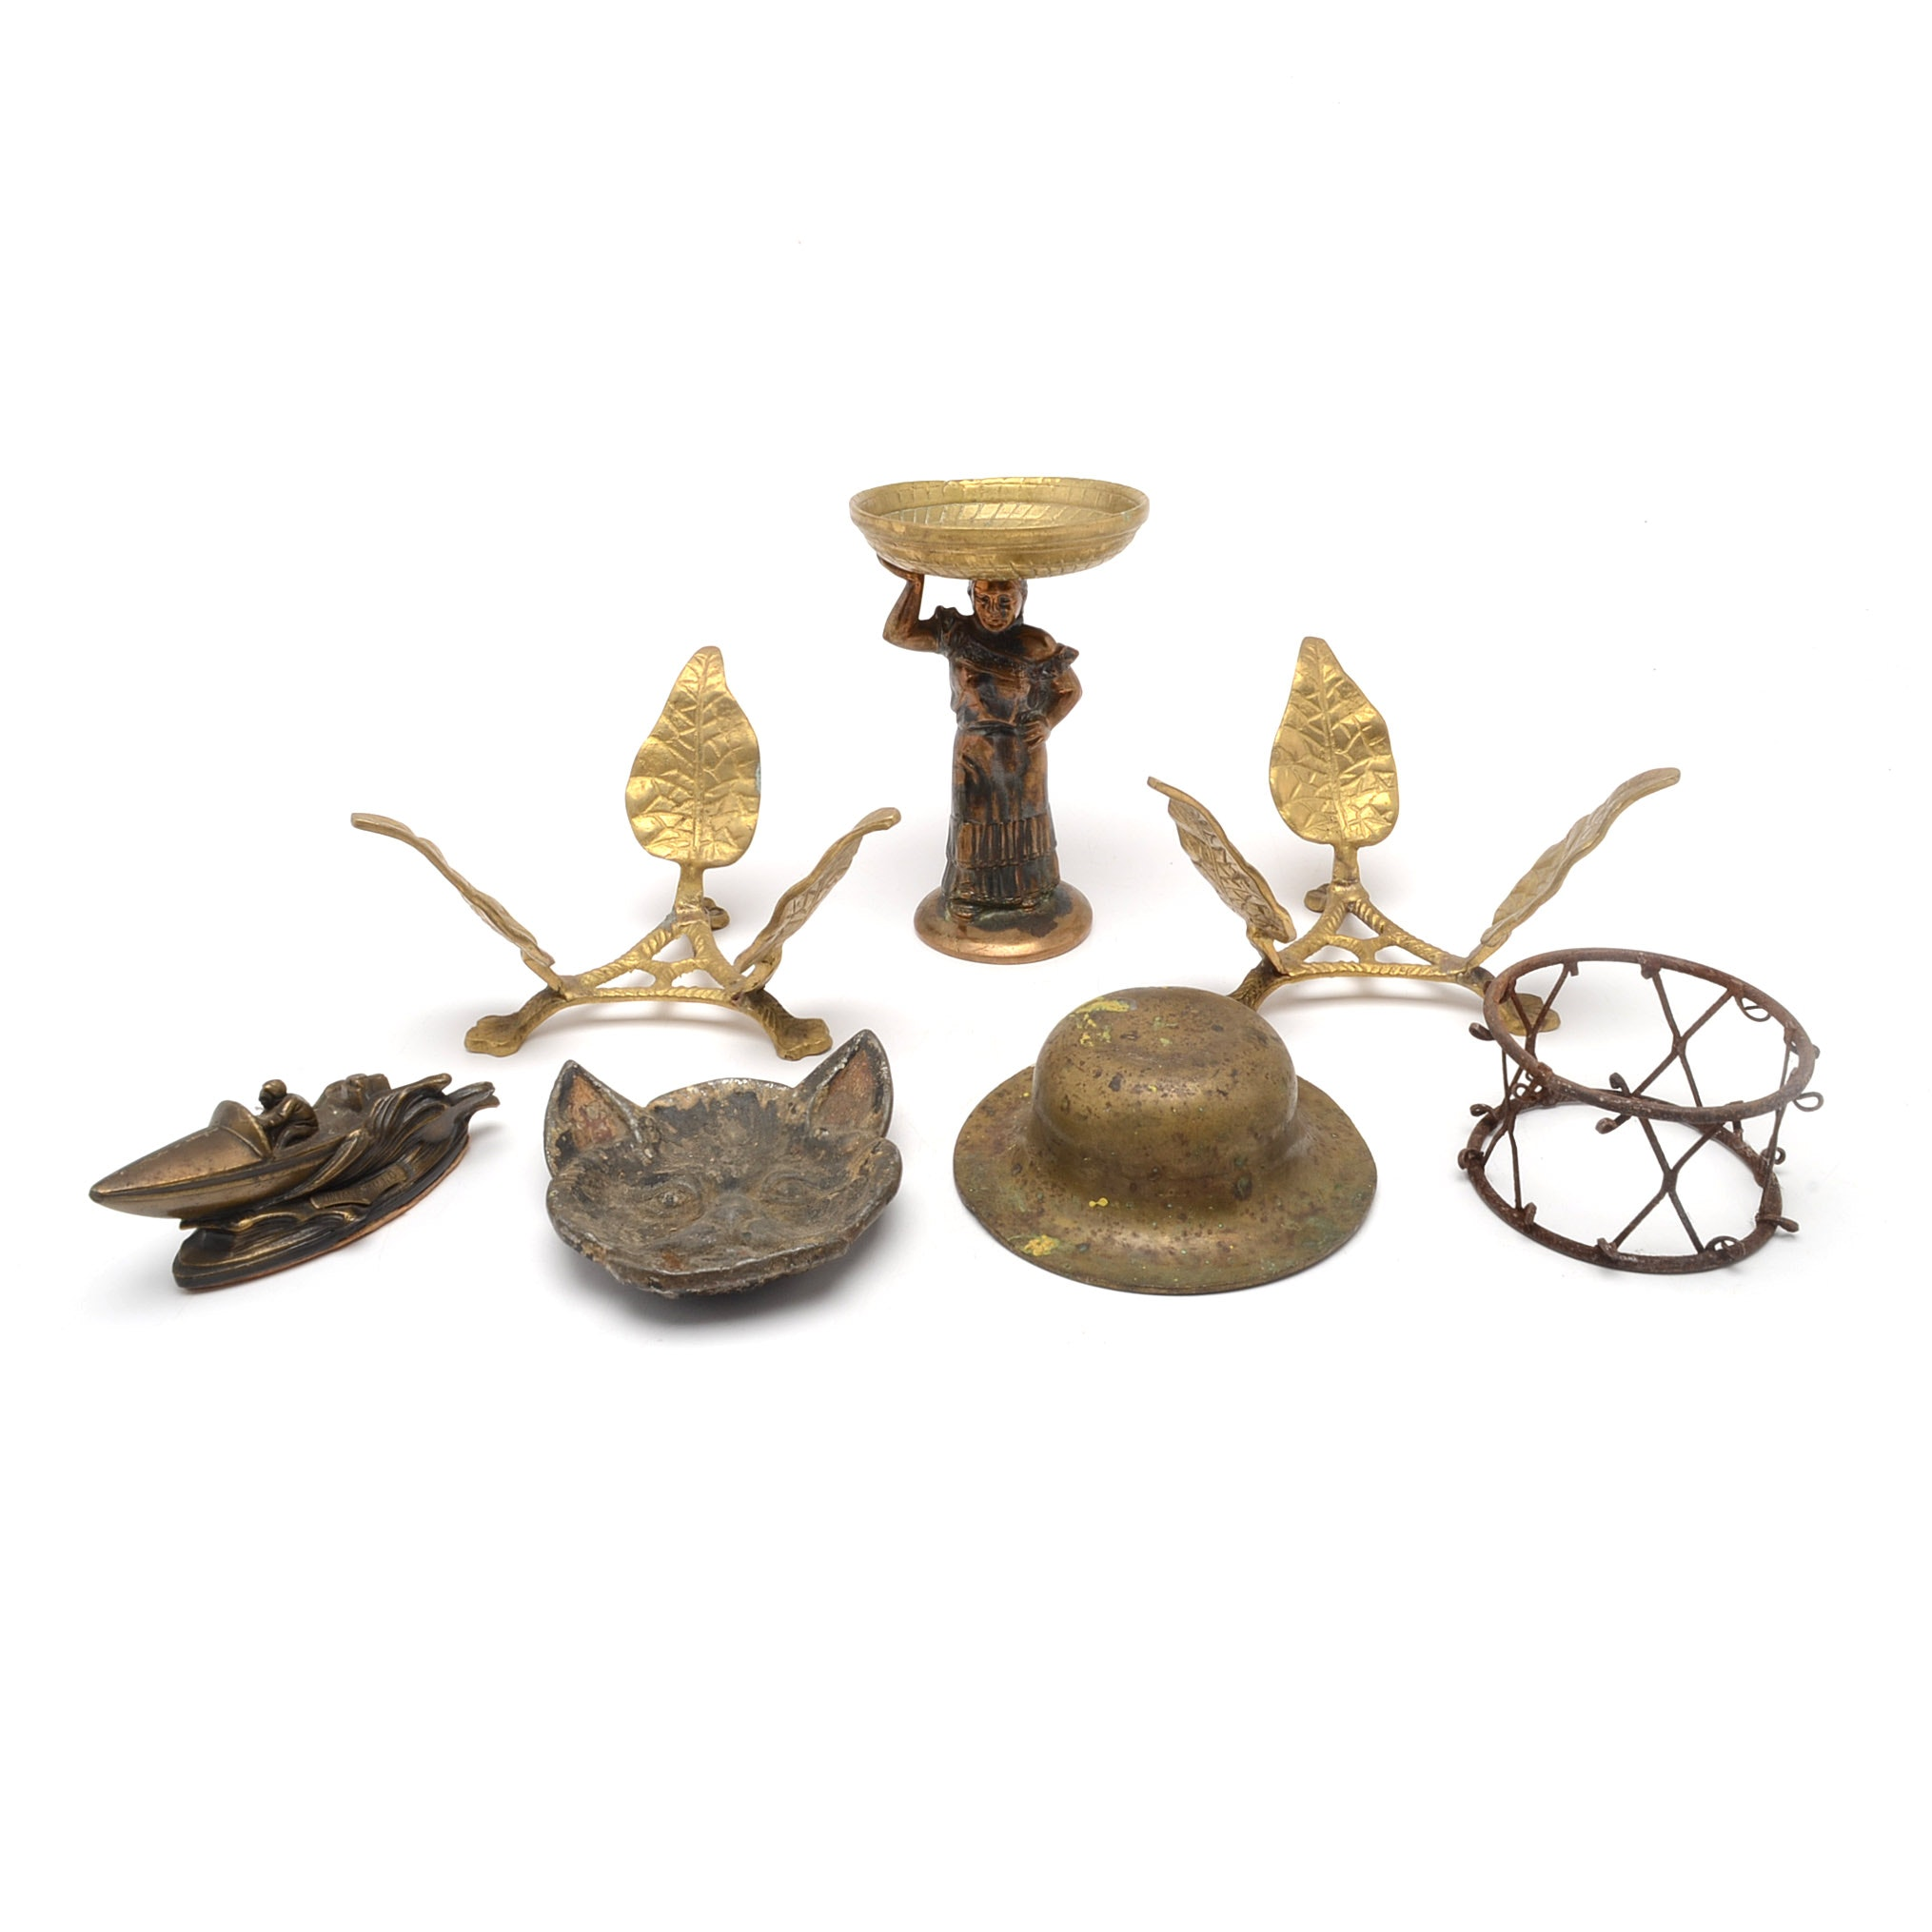 Assortment of Metal Decor